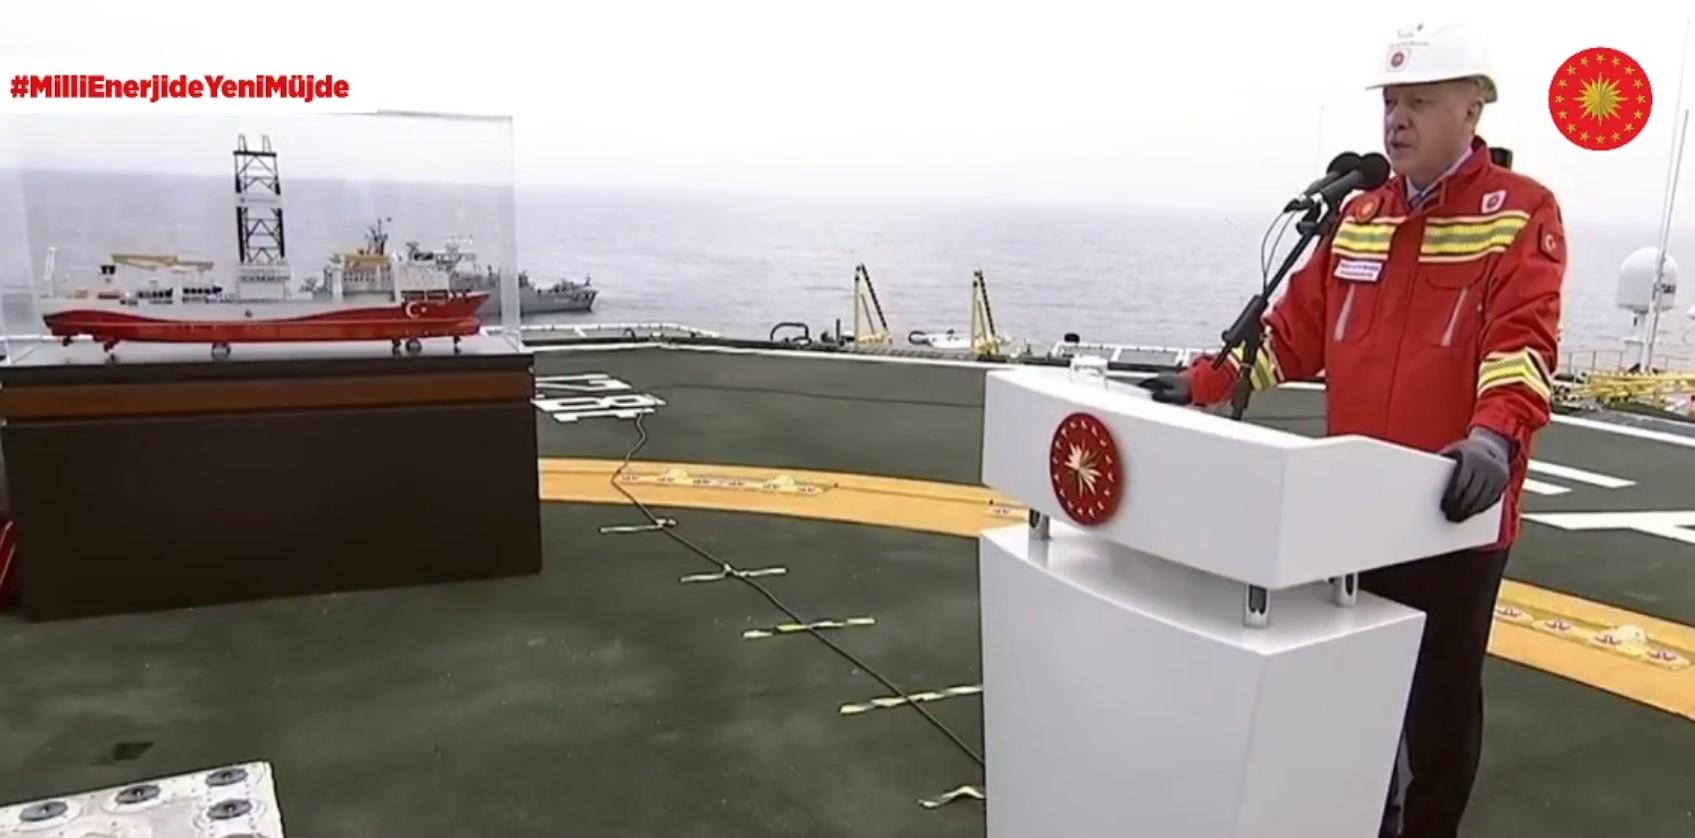 Recep Tayyip Erdoğan speaking onboard the Fatih drillship; Source: Erdoğan's Twitter account